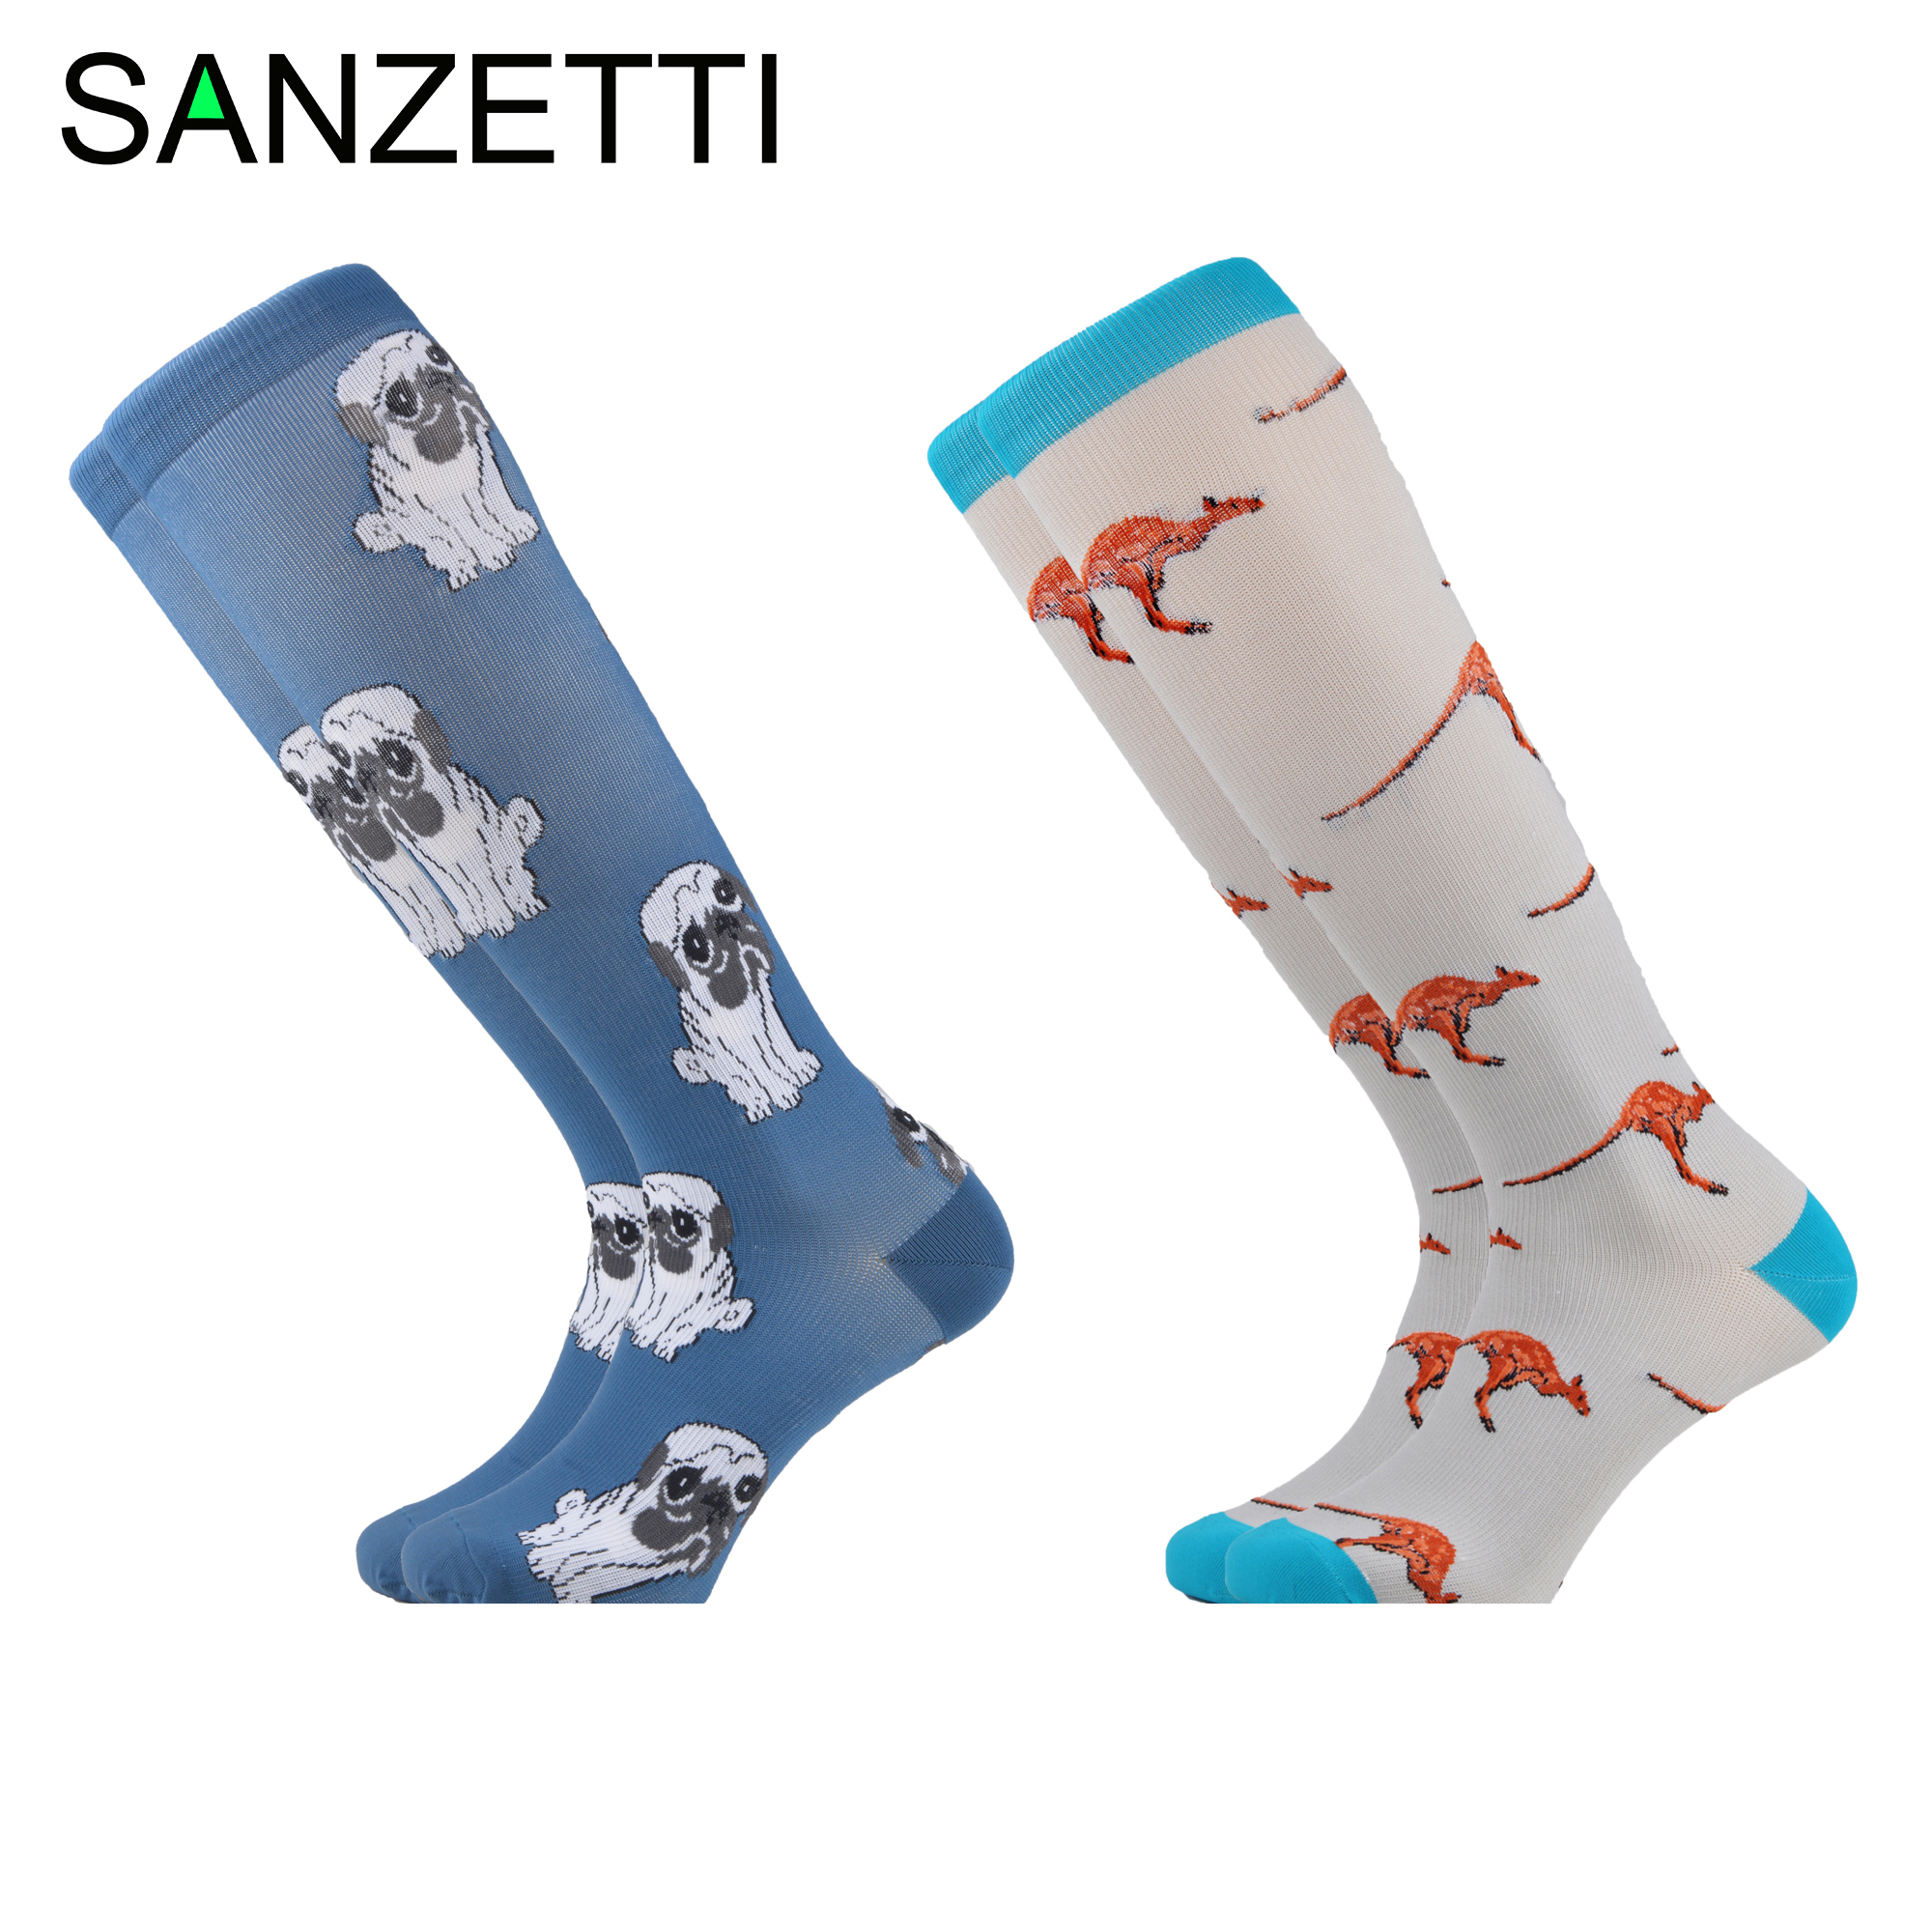 SANZETTI 2 Pairs/Lot Women Leg Support Stretch Combed Cotton Compression Socks Animal Below Knee Anti-Fatigue Long Happy Socks